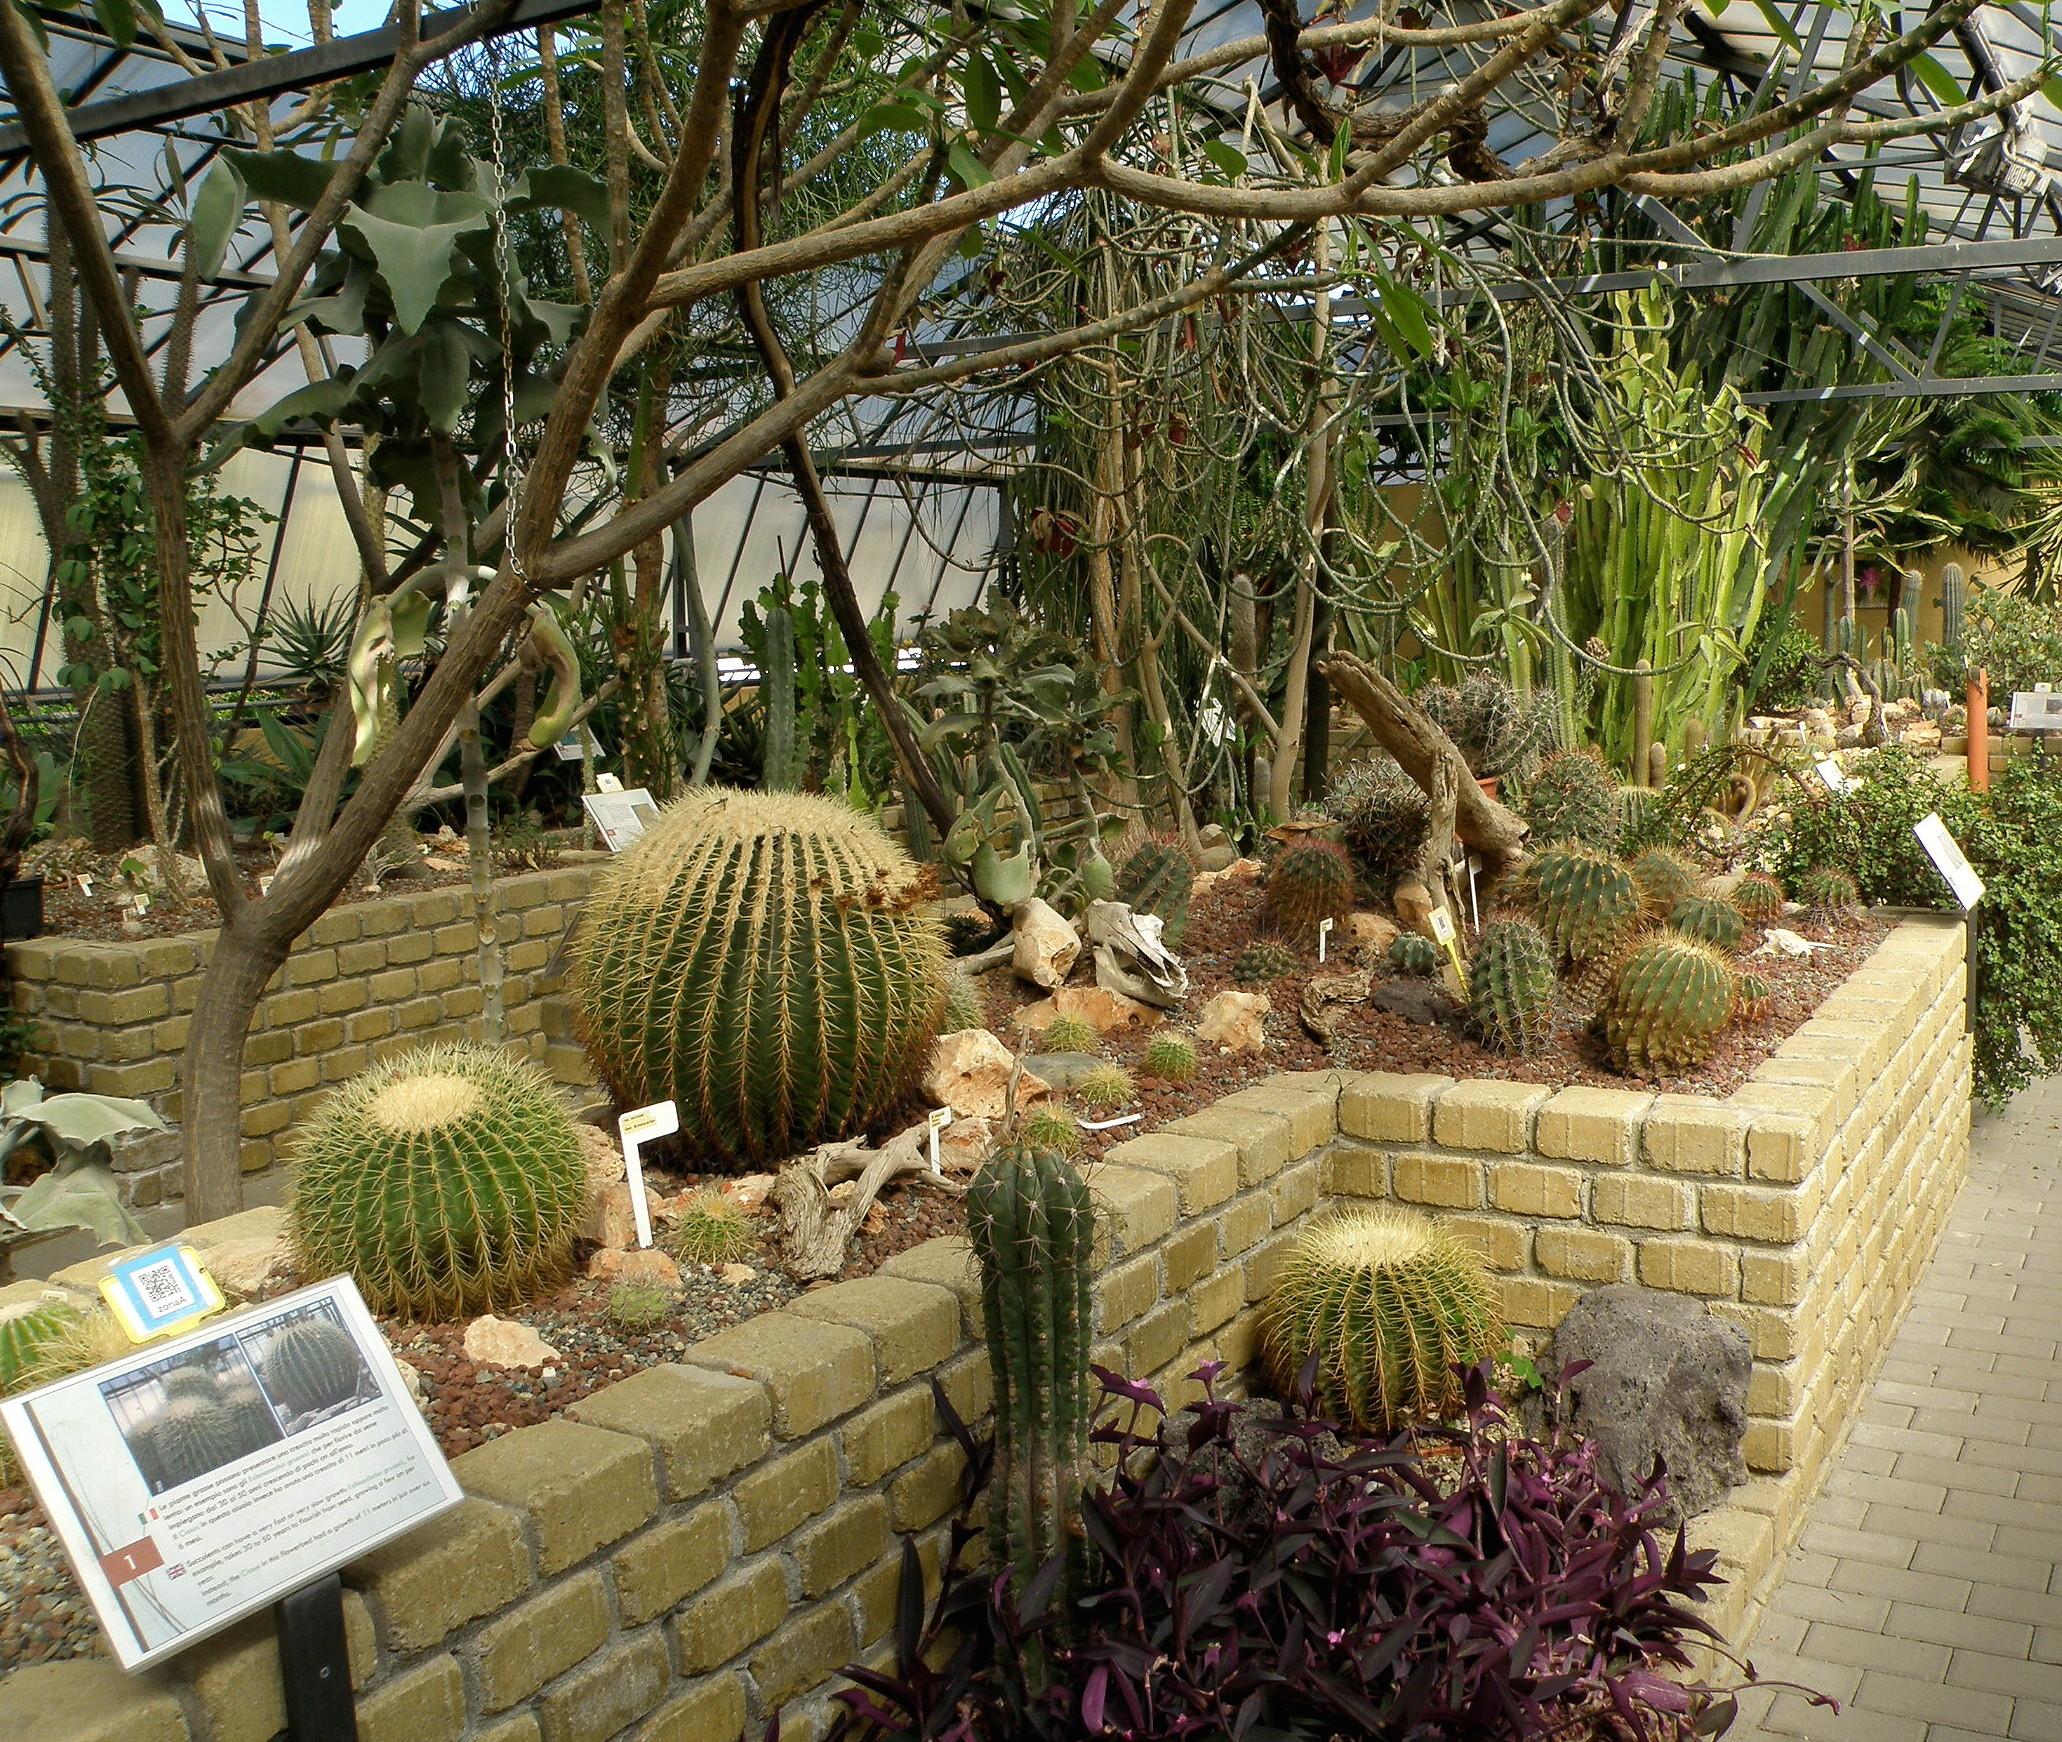 Giardino Botanico Alessandria